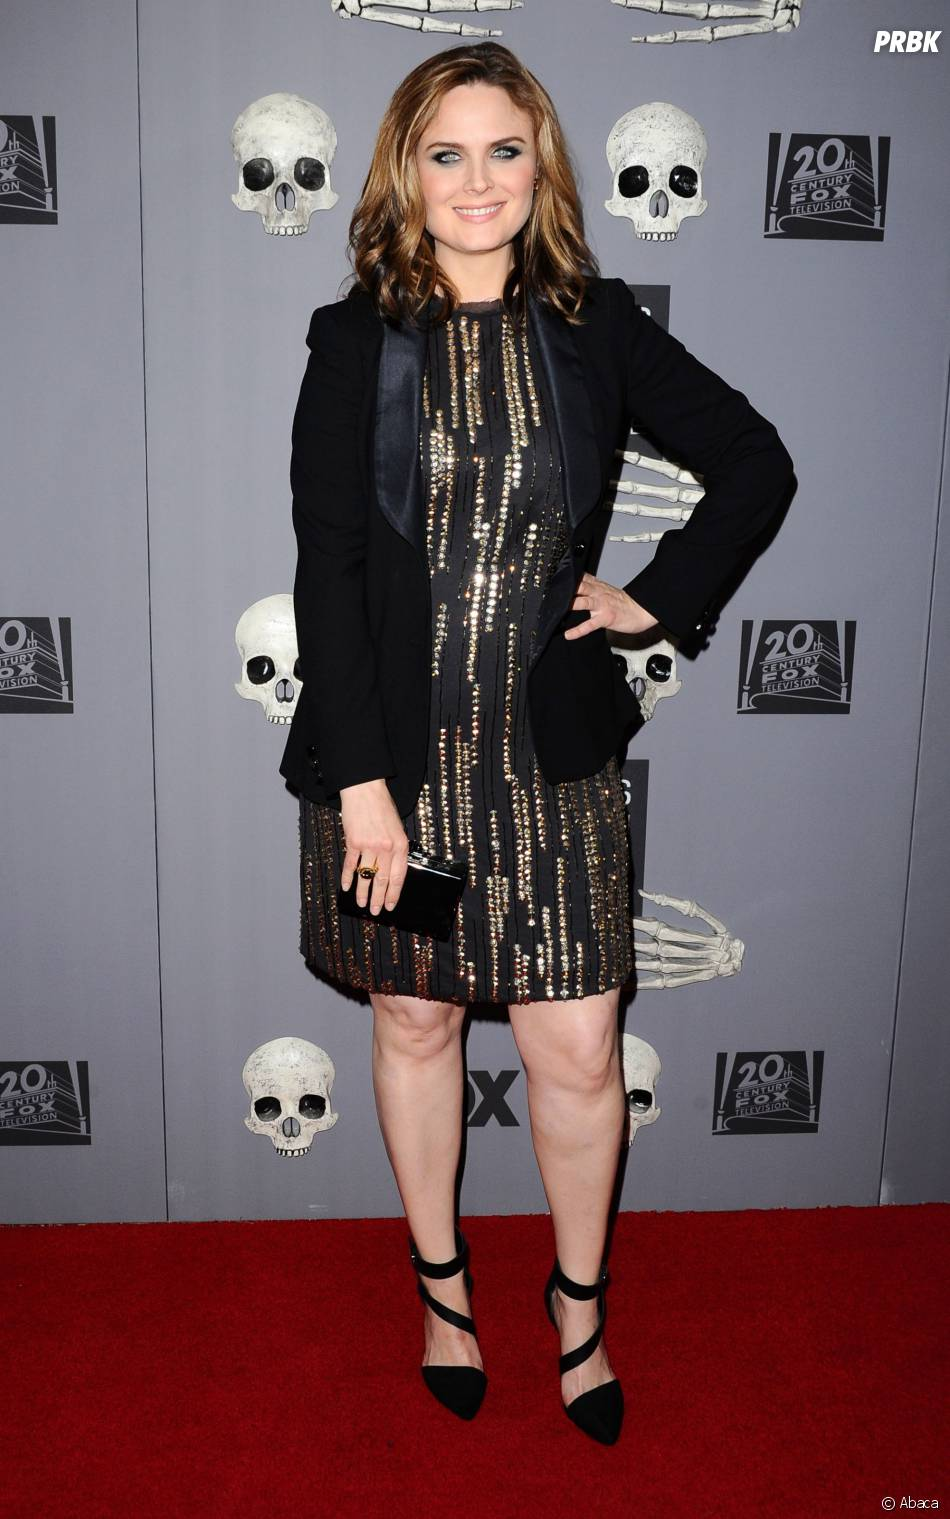 Bones saison 10 : Emily Deschanel parle de sa grossesse